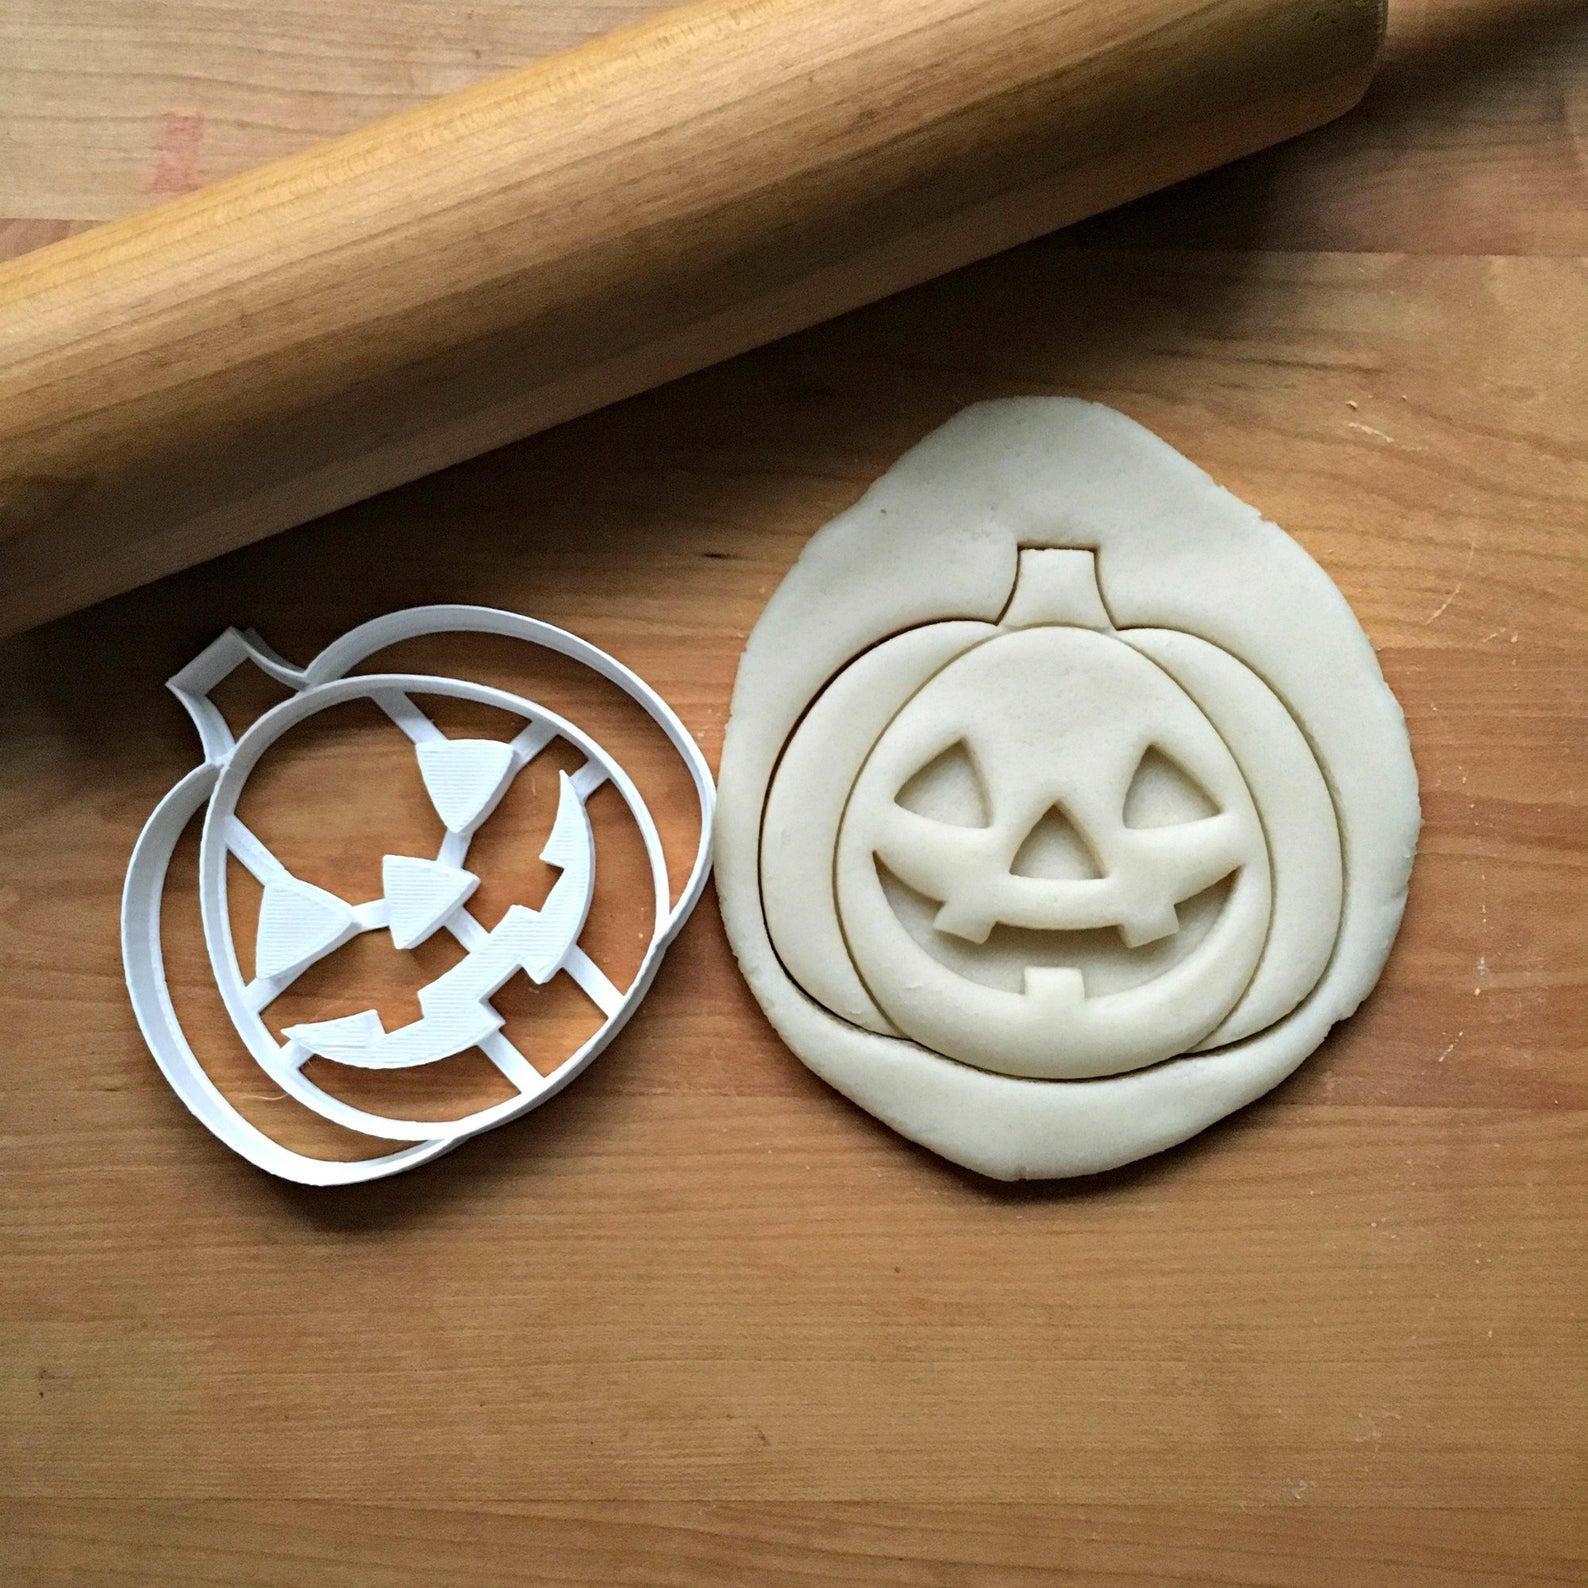 Jack-O-Lantern Cookie Cutter